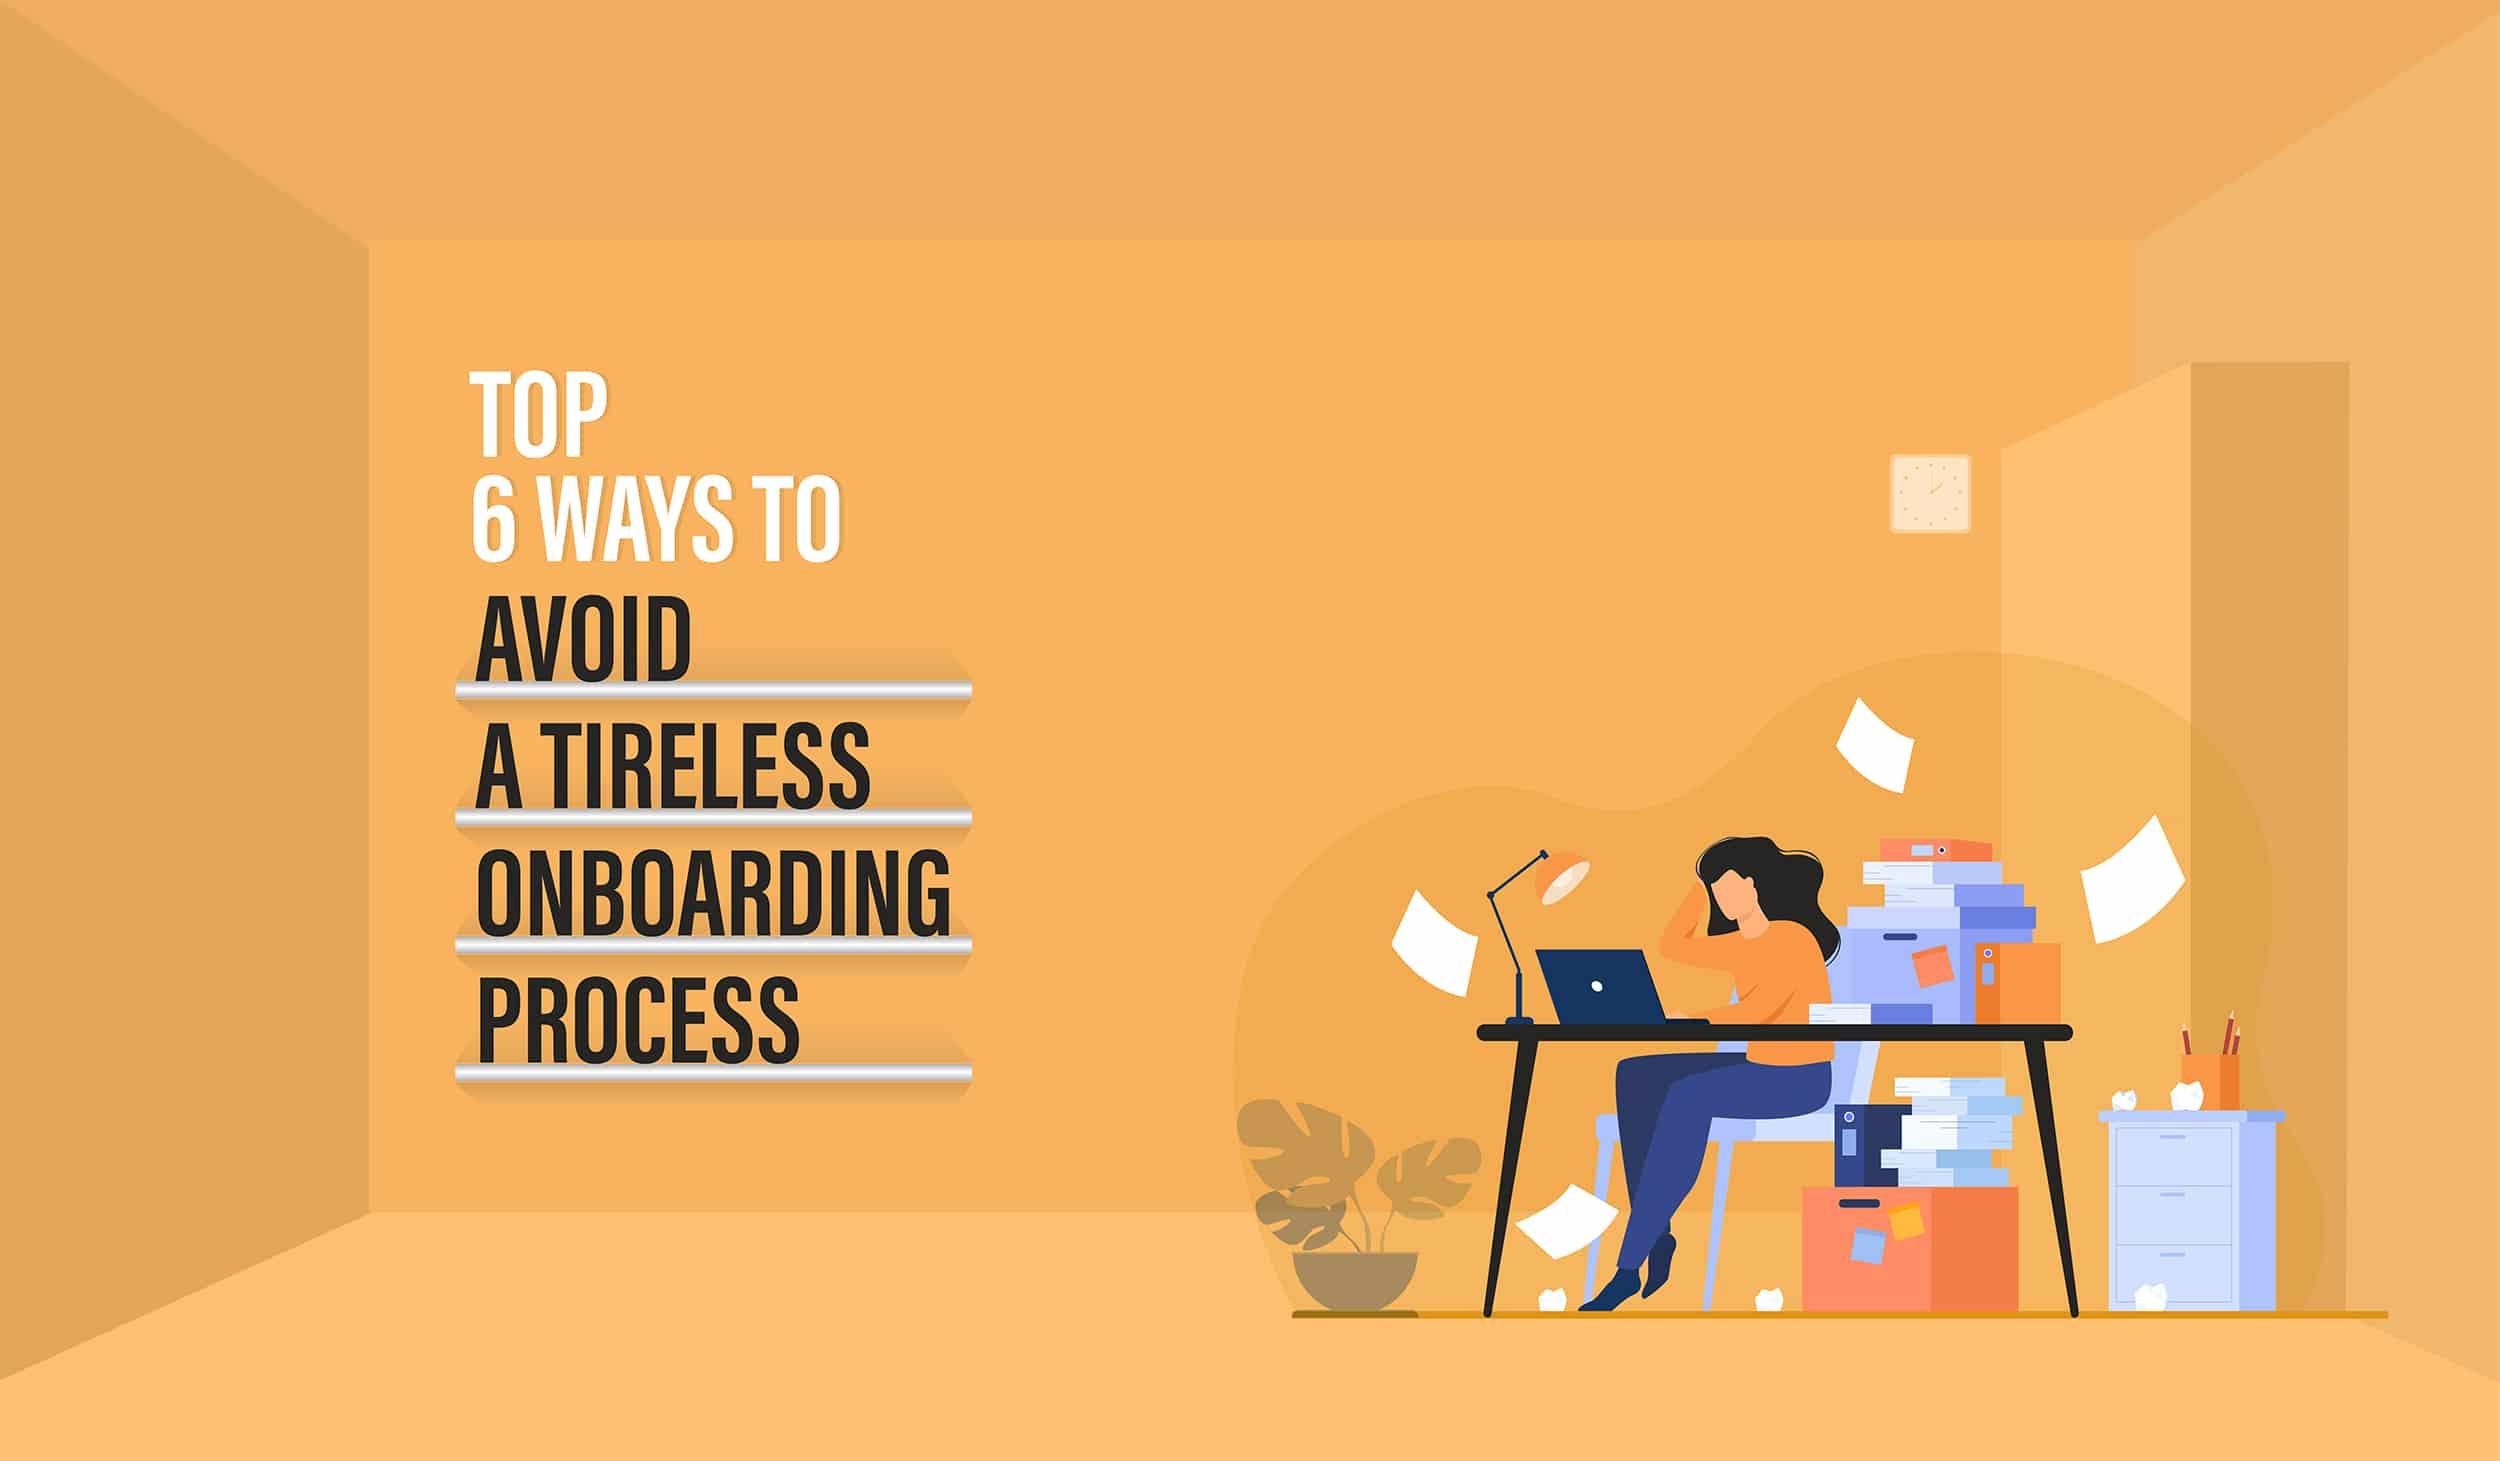 ways to avoid a tireless onboarding process